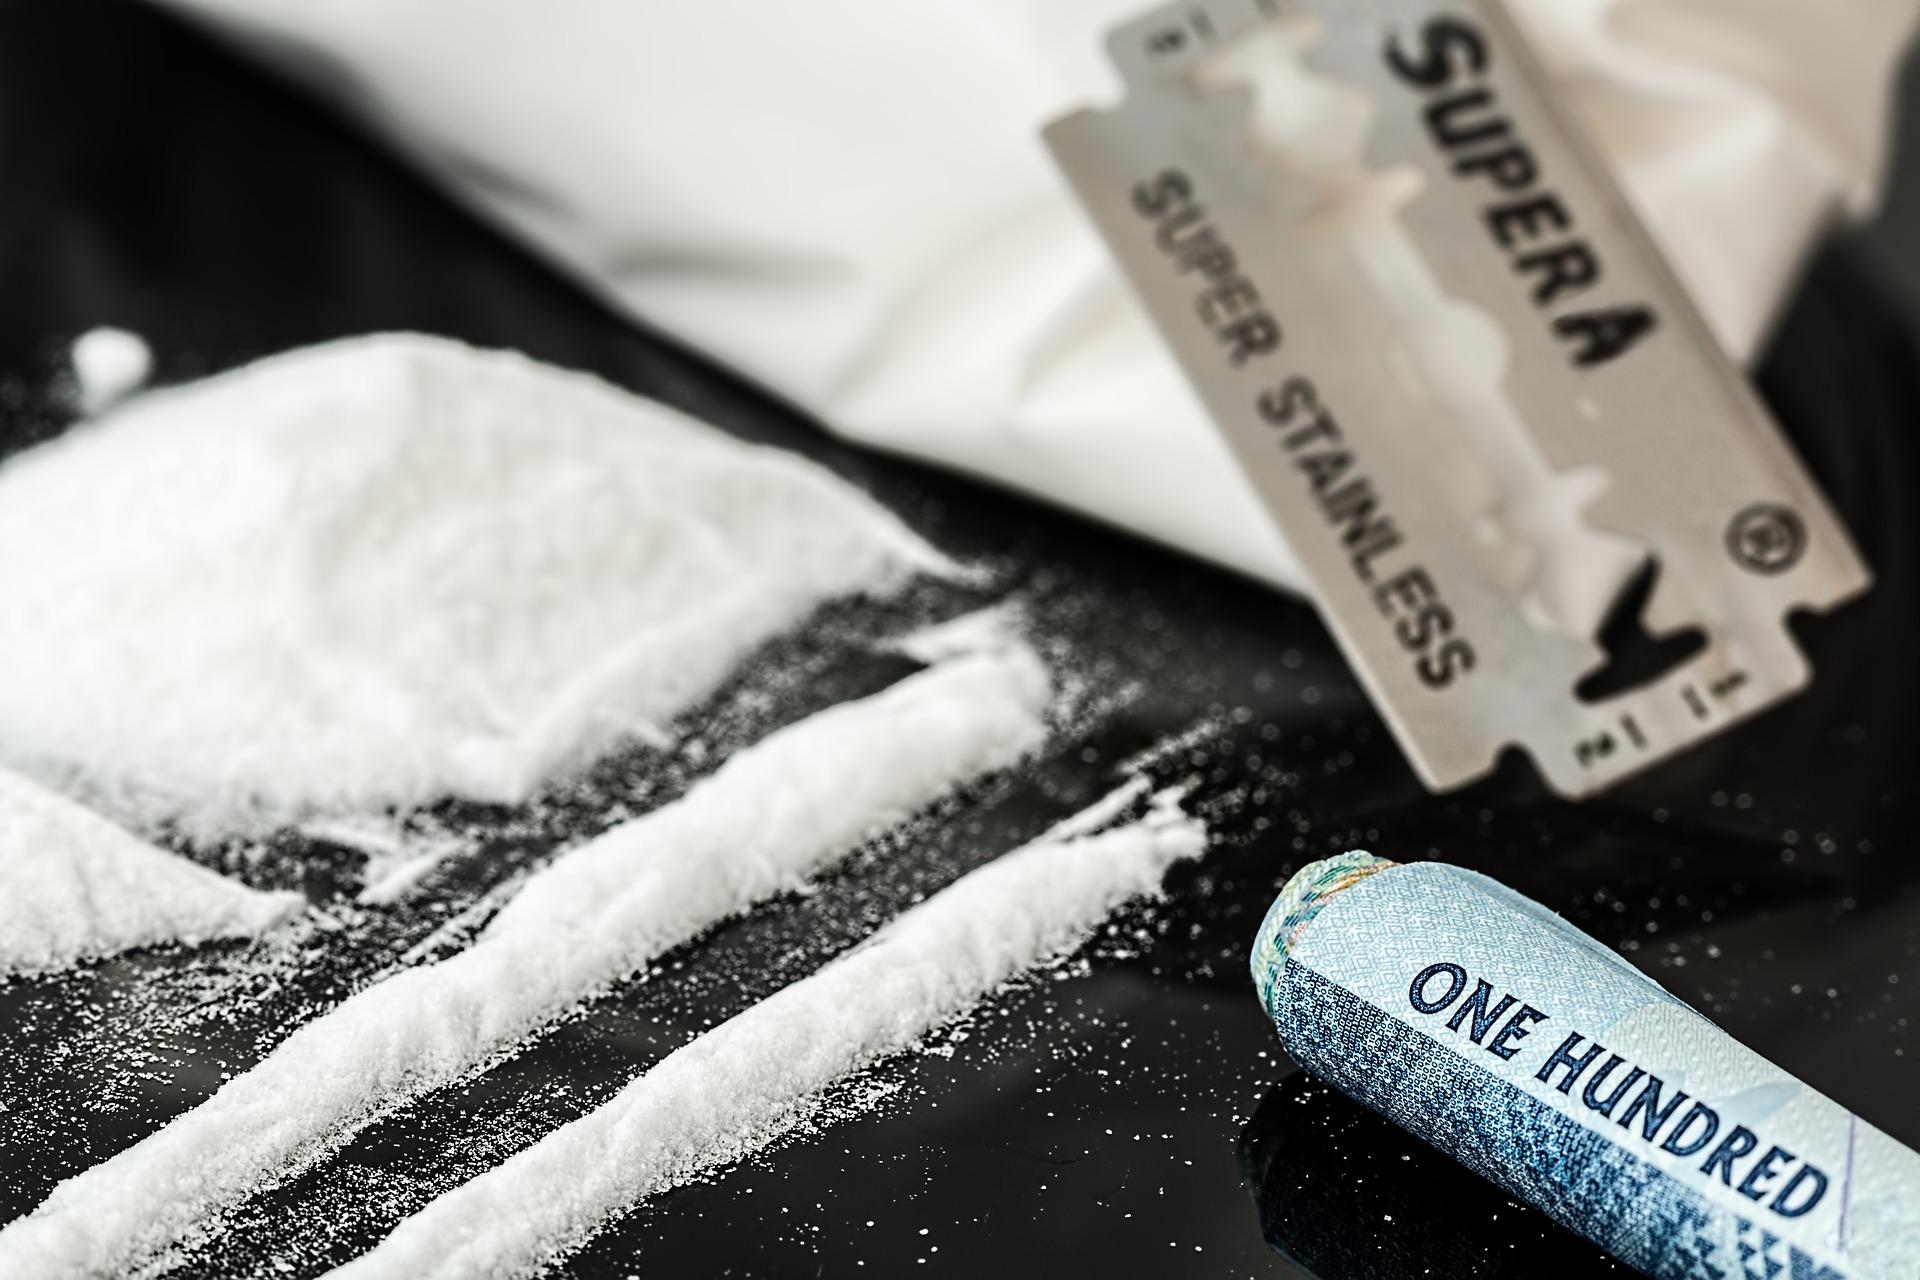 Detectives para investigar adicciones